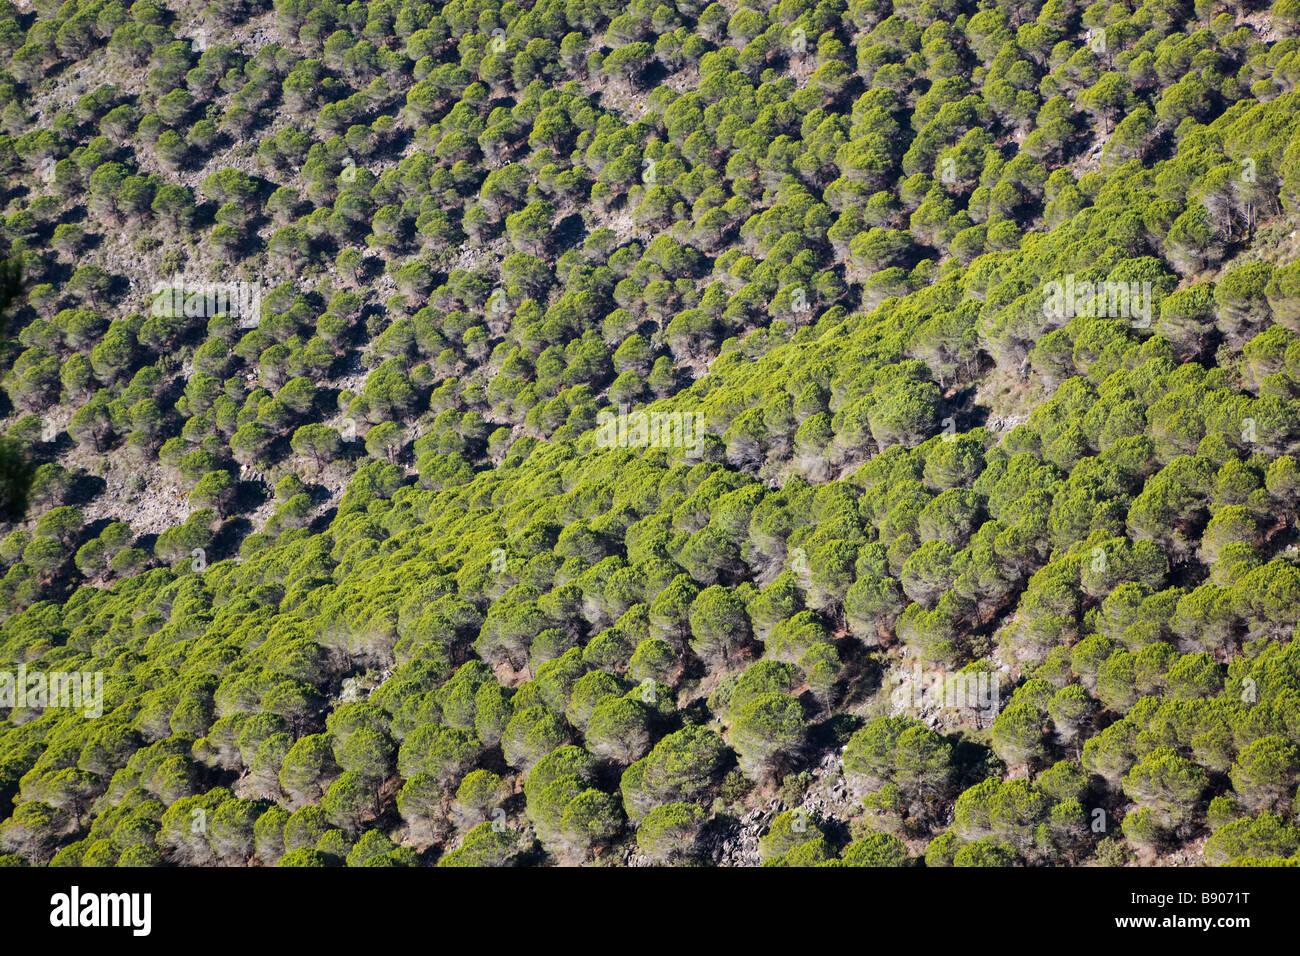 Hillside with plantations of Mediterranean pines near Fuengirola Malaga Province Costa del Sol Spain - Stock Image